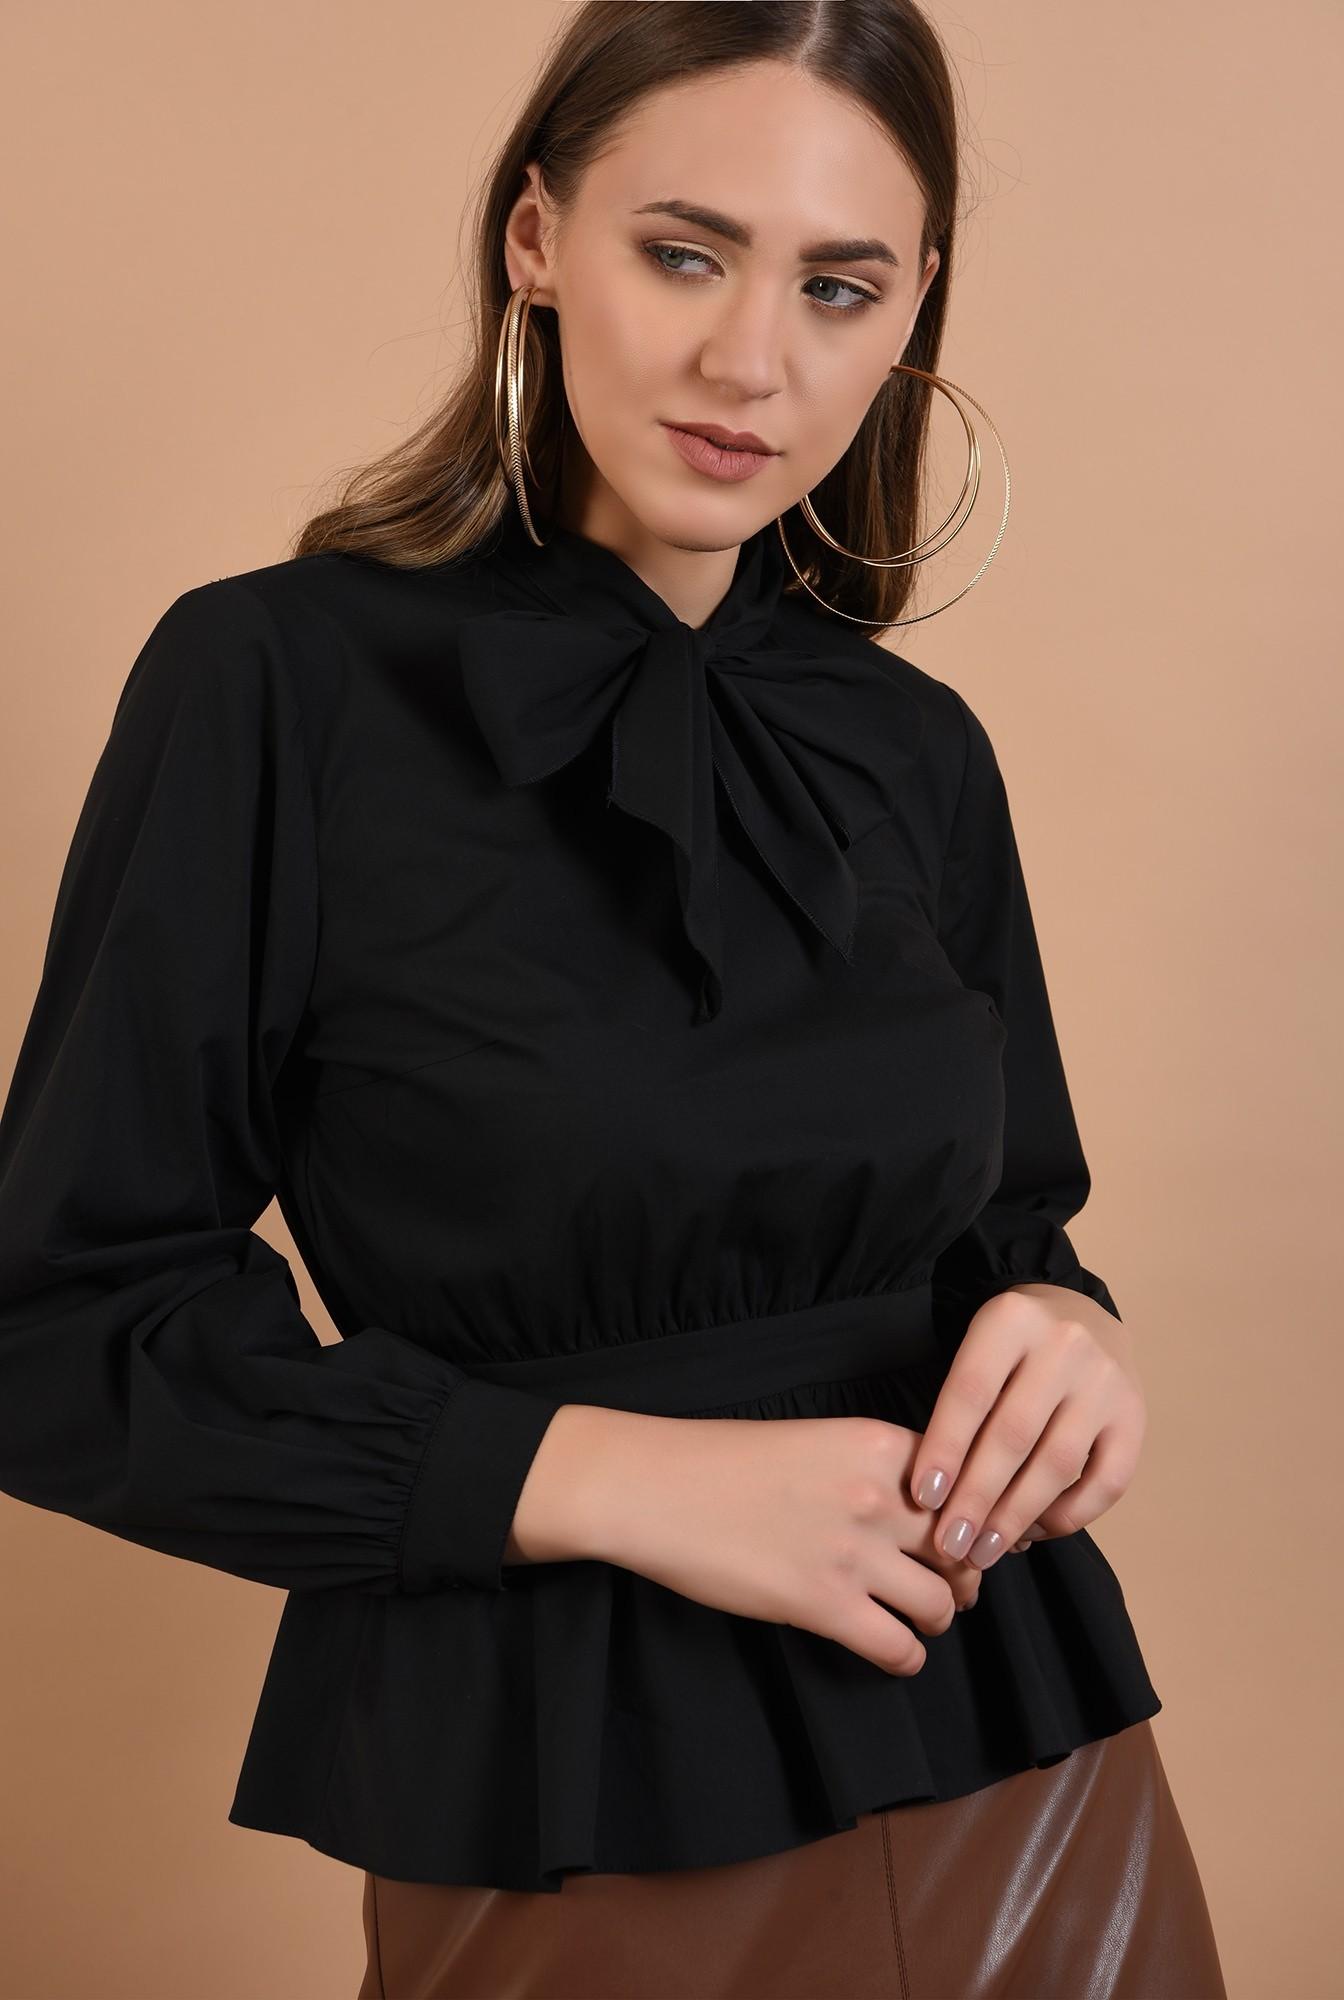 bluza din poplin, funda la gat, maneci cu manseta, neagra